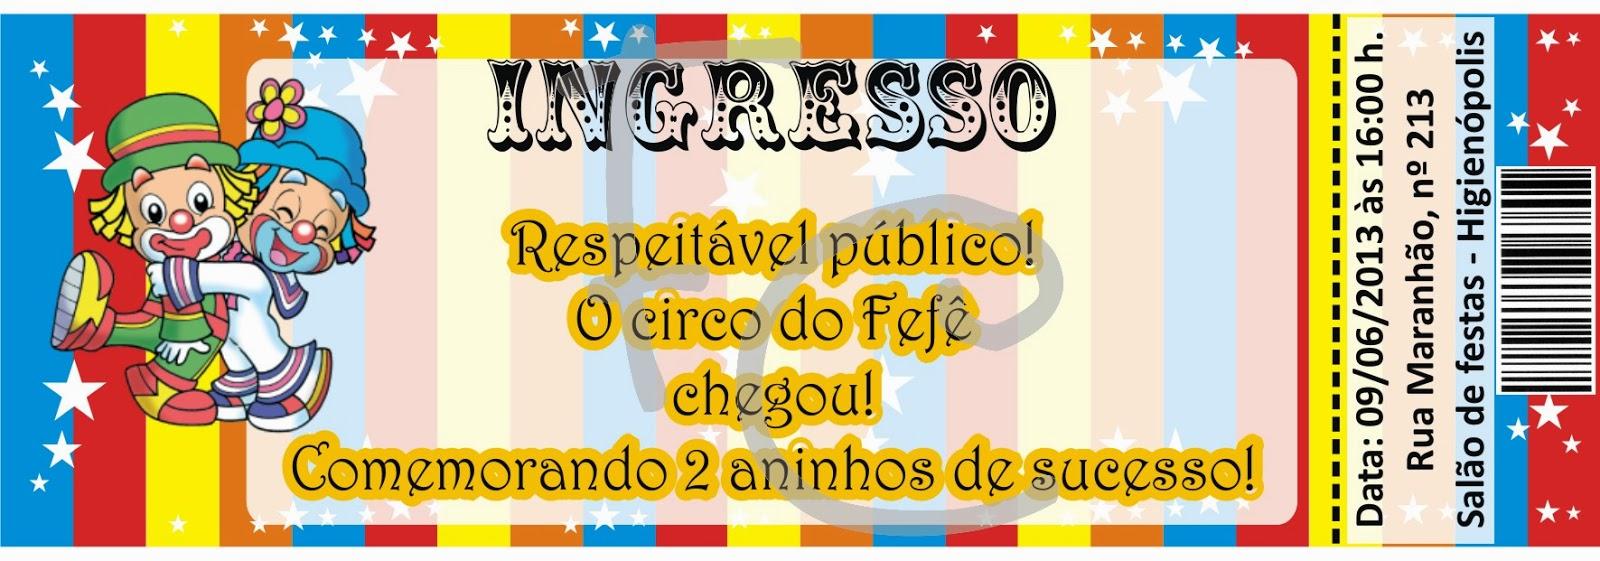 Convite Ingresso - Patati Patata